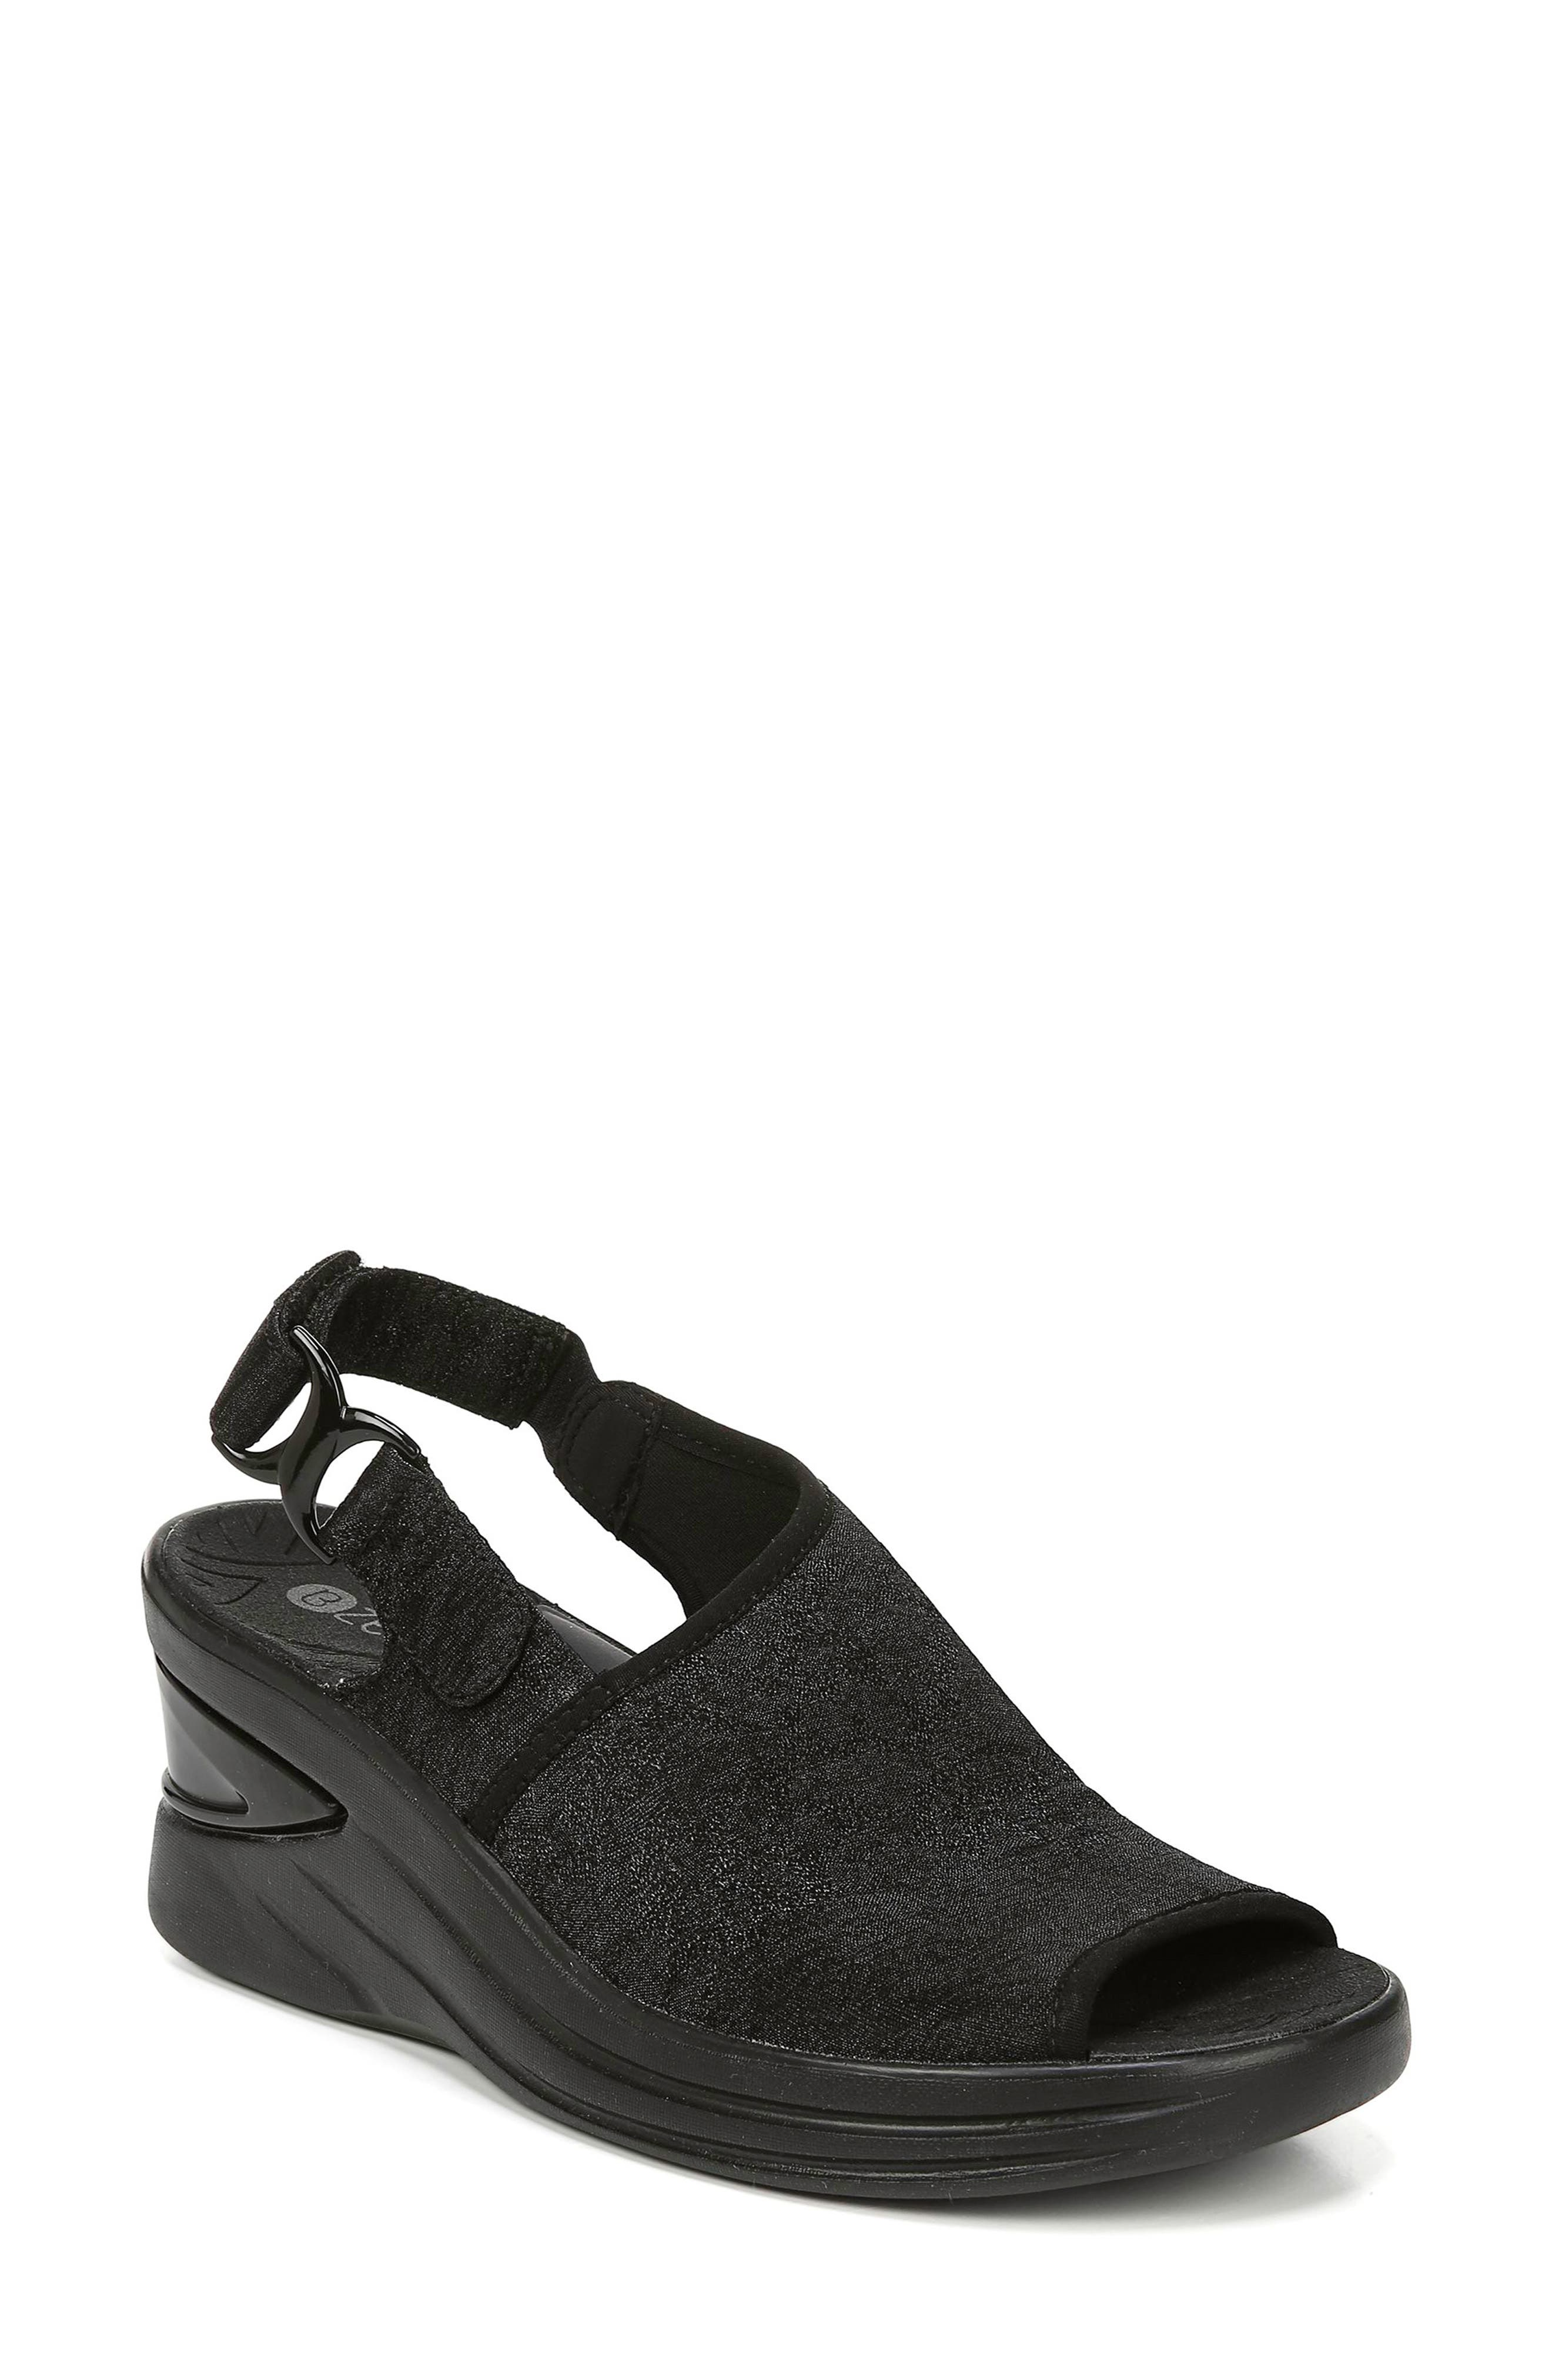 Bzees Vivia Slingback Wedge Sandal- Black